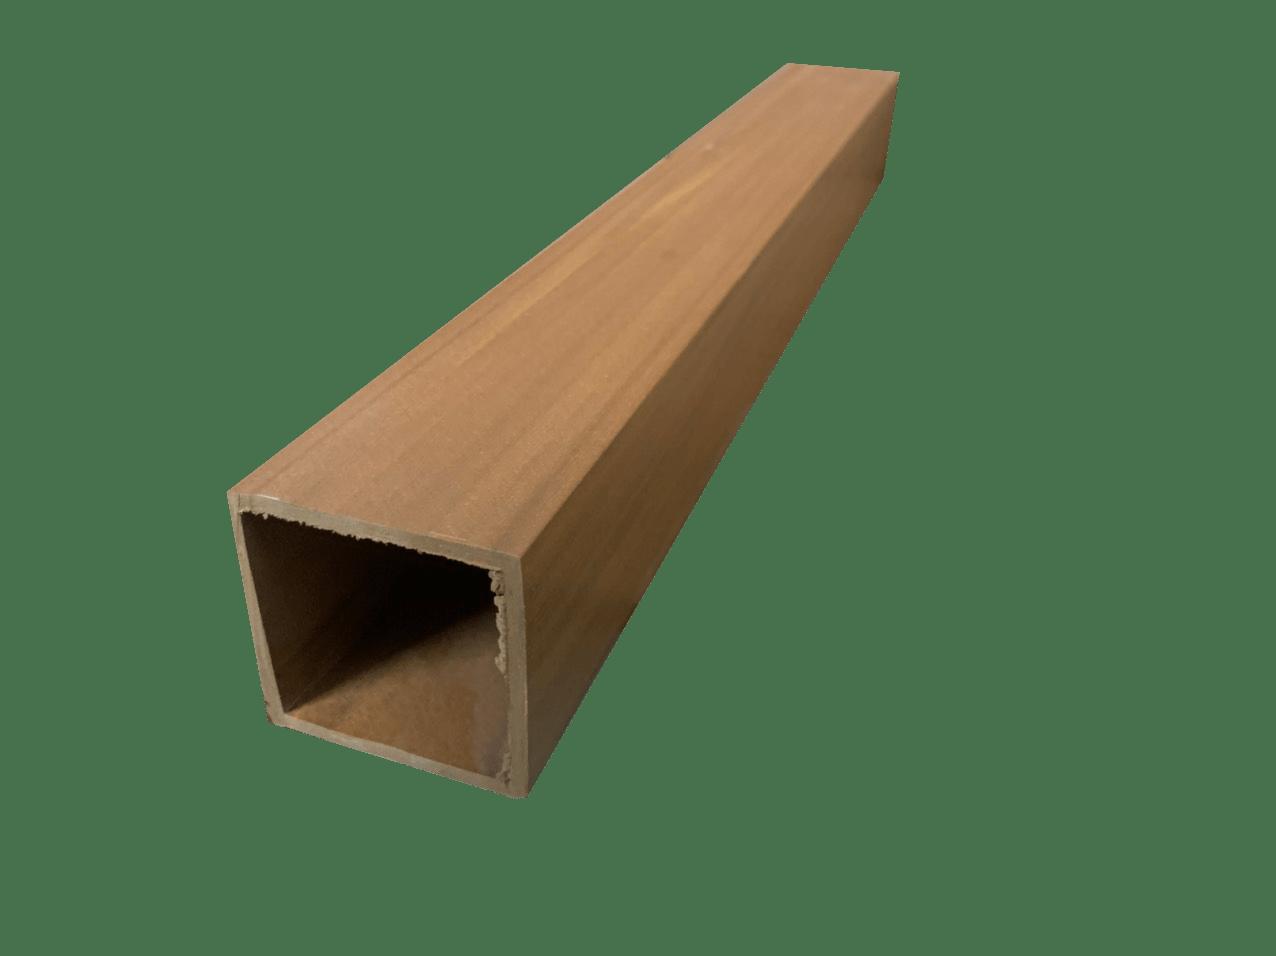 Mẫu 1 lam gỗ nhựa Ecovina